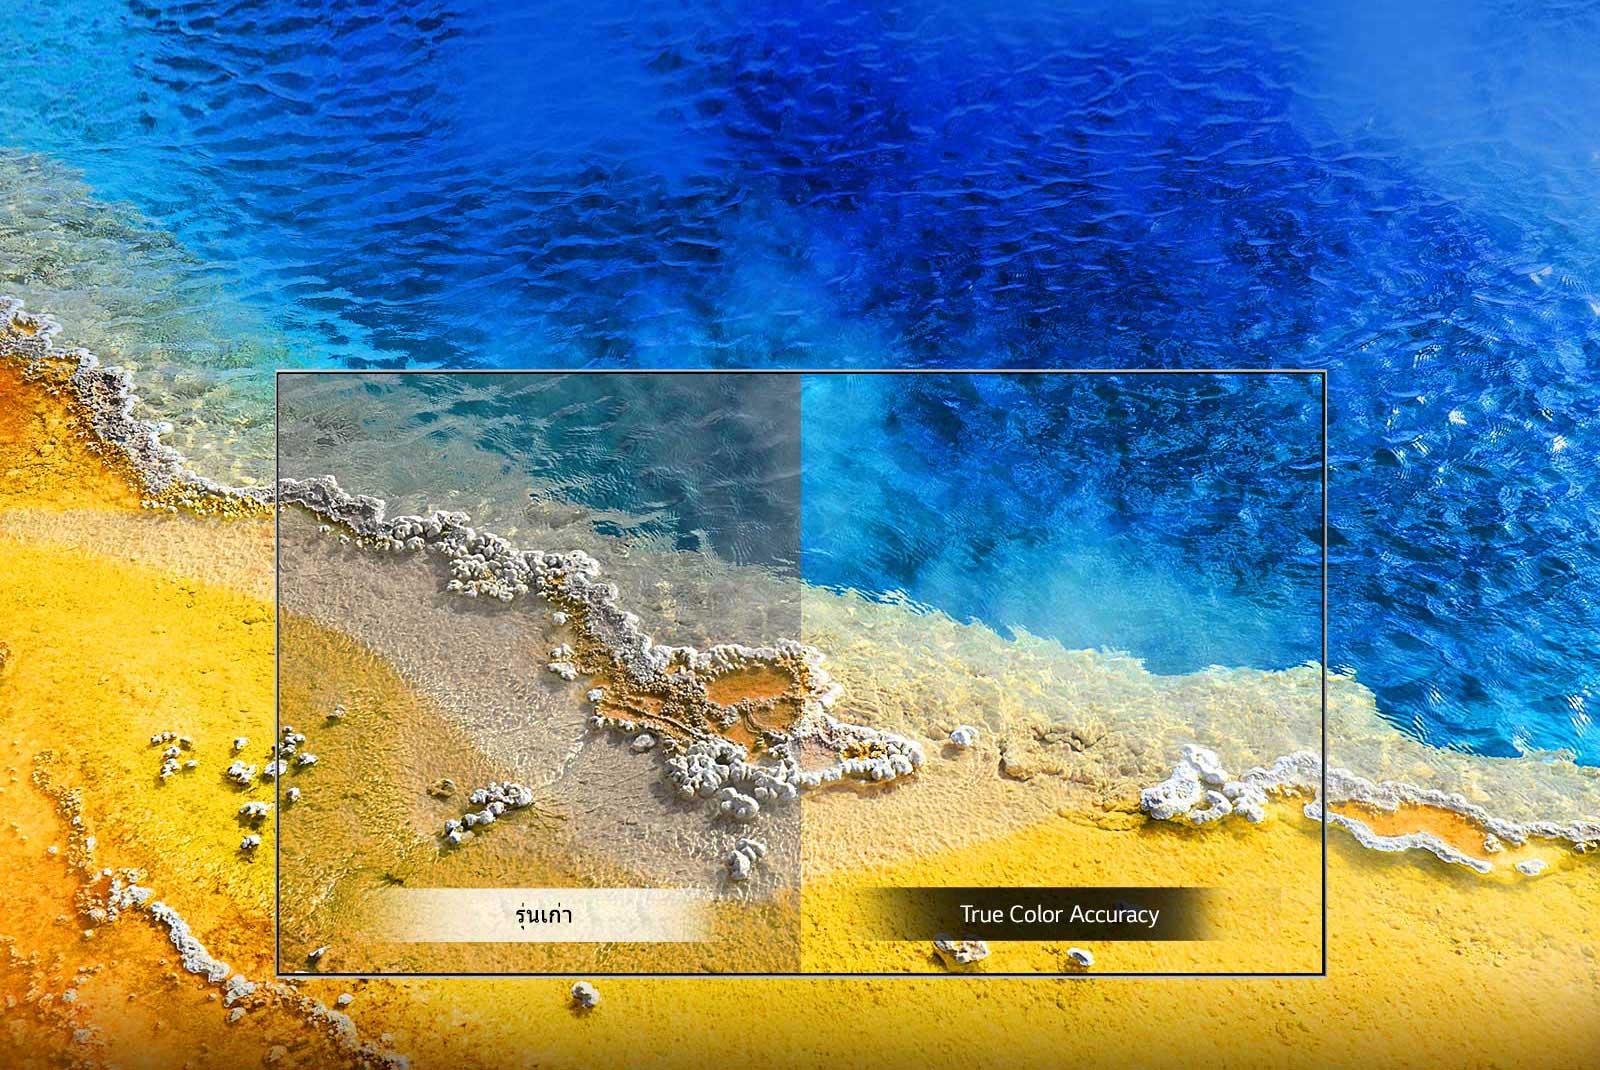 TV-UHD-UM71-04-True-Color-Accuracy-Desktop